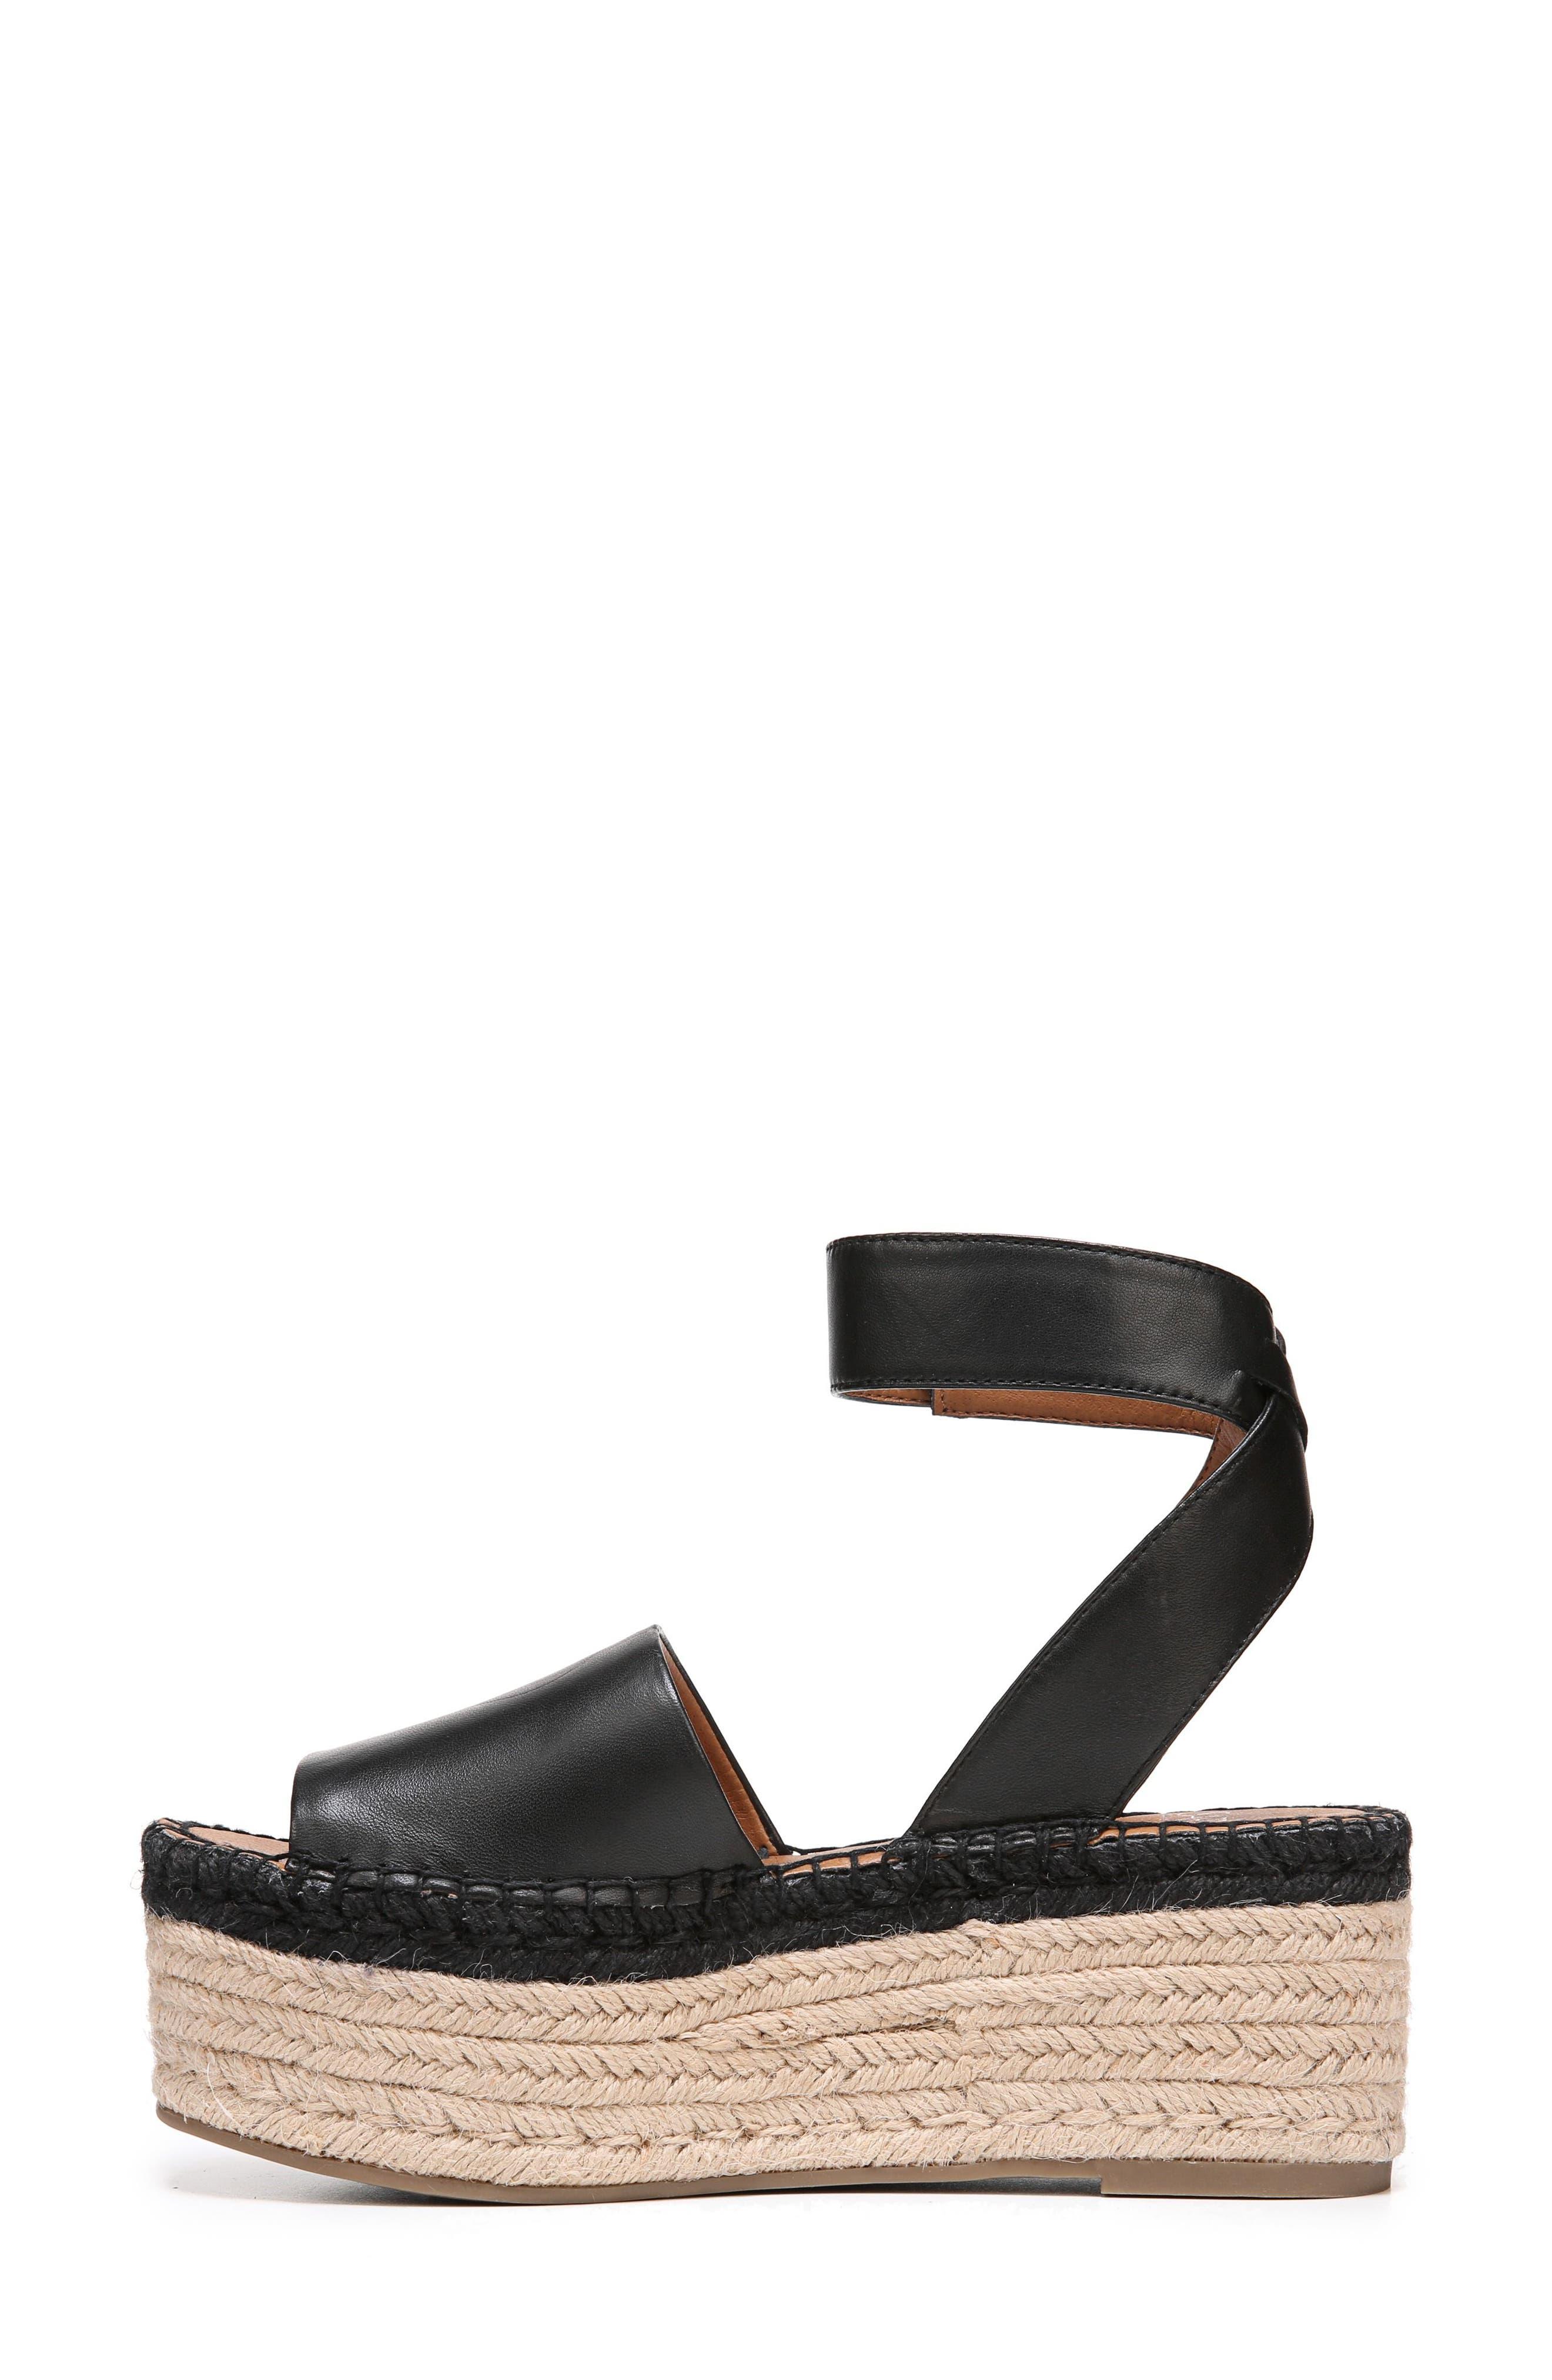 Maisi Platform Espadrille Sandal,                             Alternate thumbnail 3, color,                             BLACK LEATHER